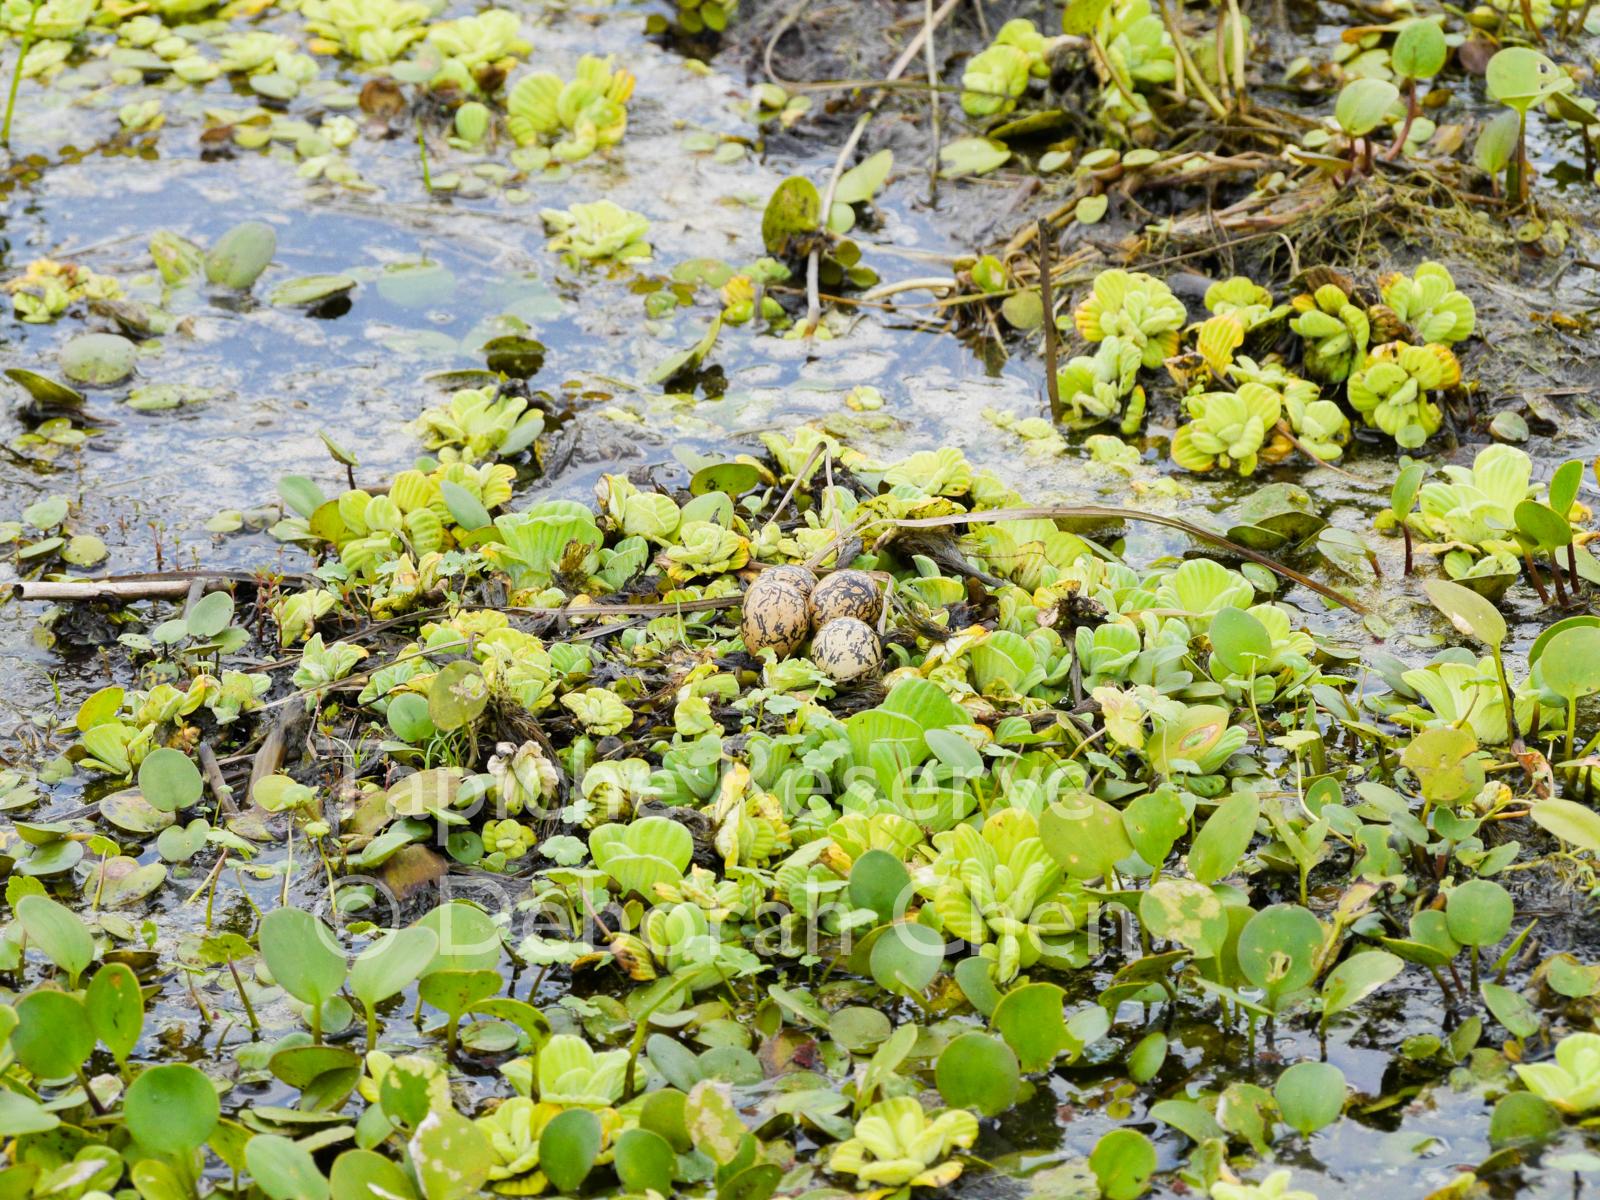 Wattled Jacana nest with eggs. Tapiche Reserve, Peru